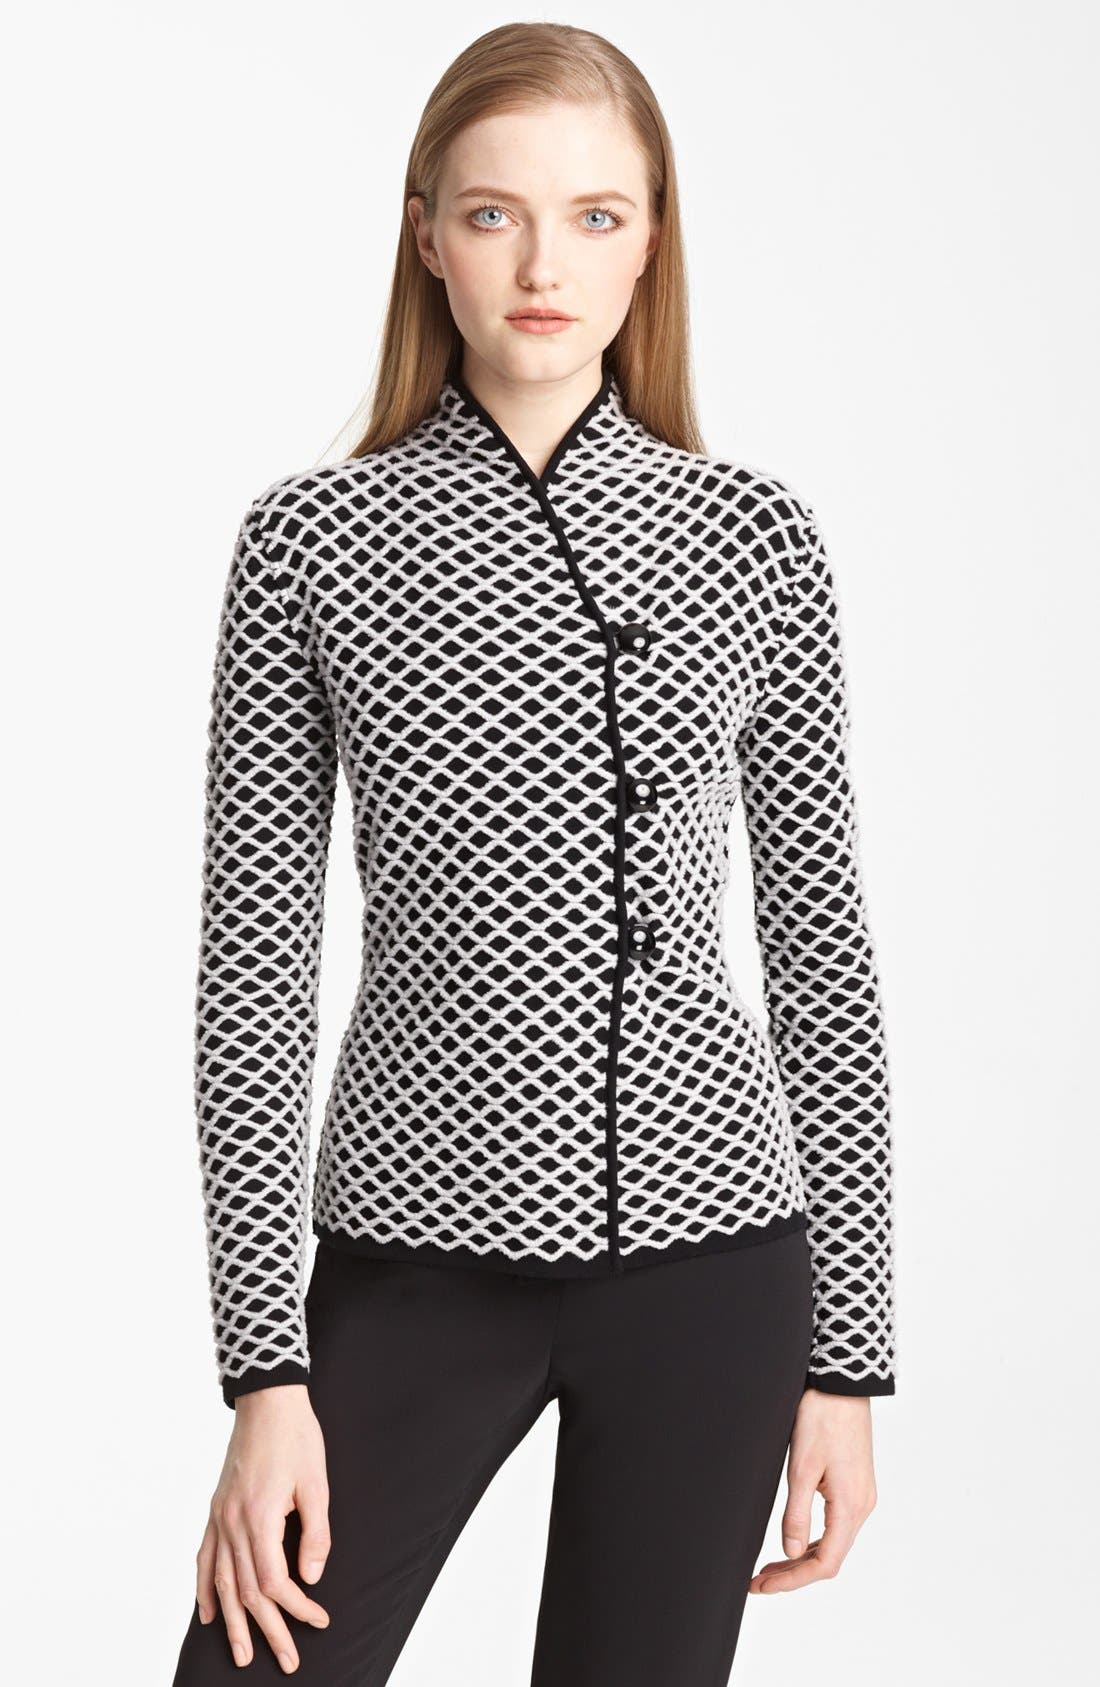 Alternate Image 1 Selected - Armani Collezioni Basket Weave Sweater Jacket